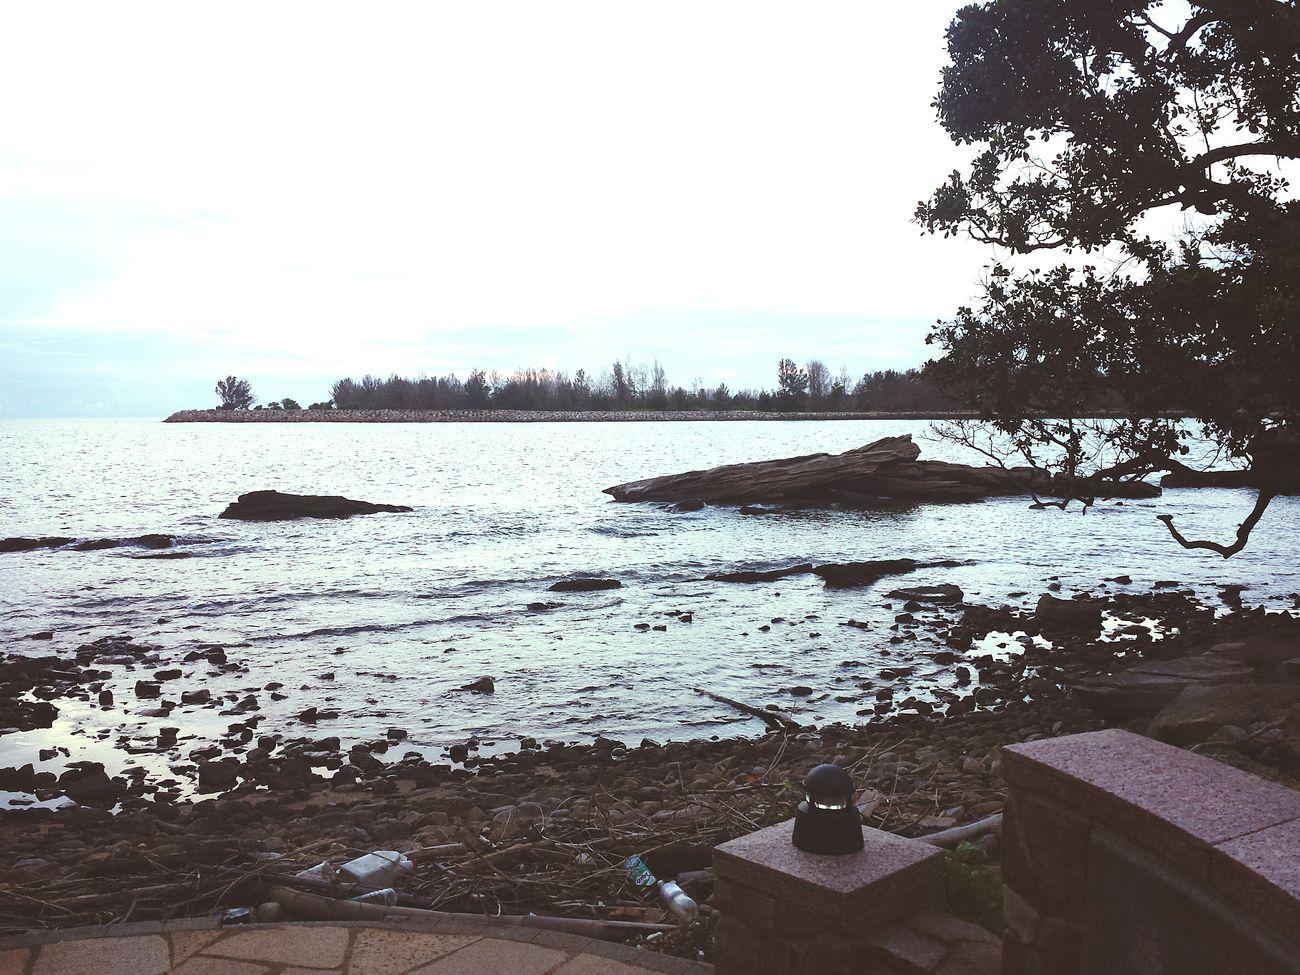 Beachphotography Sea View Brunei Darussalam